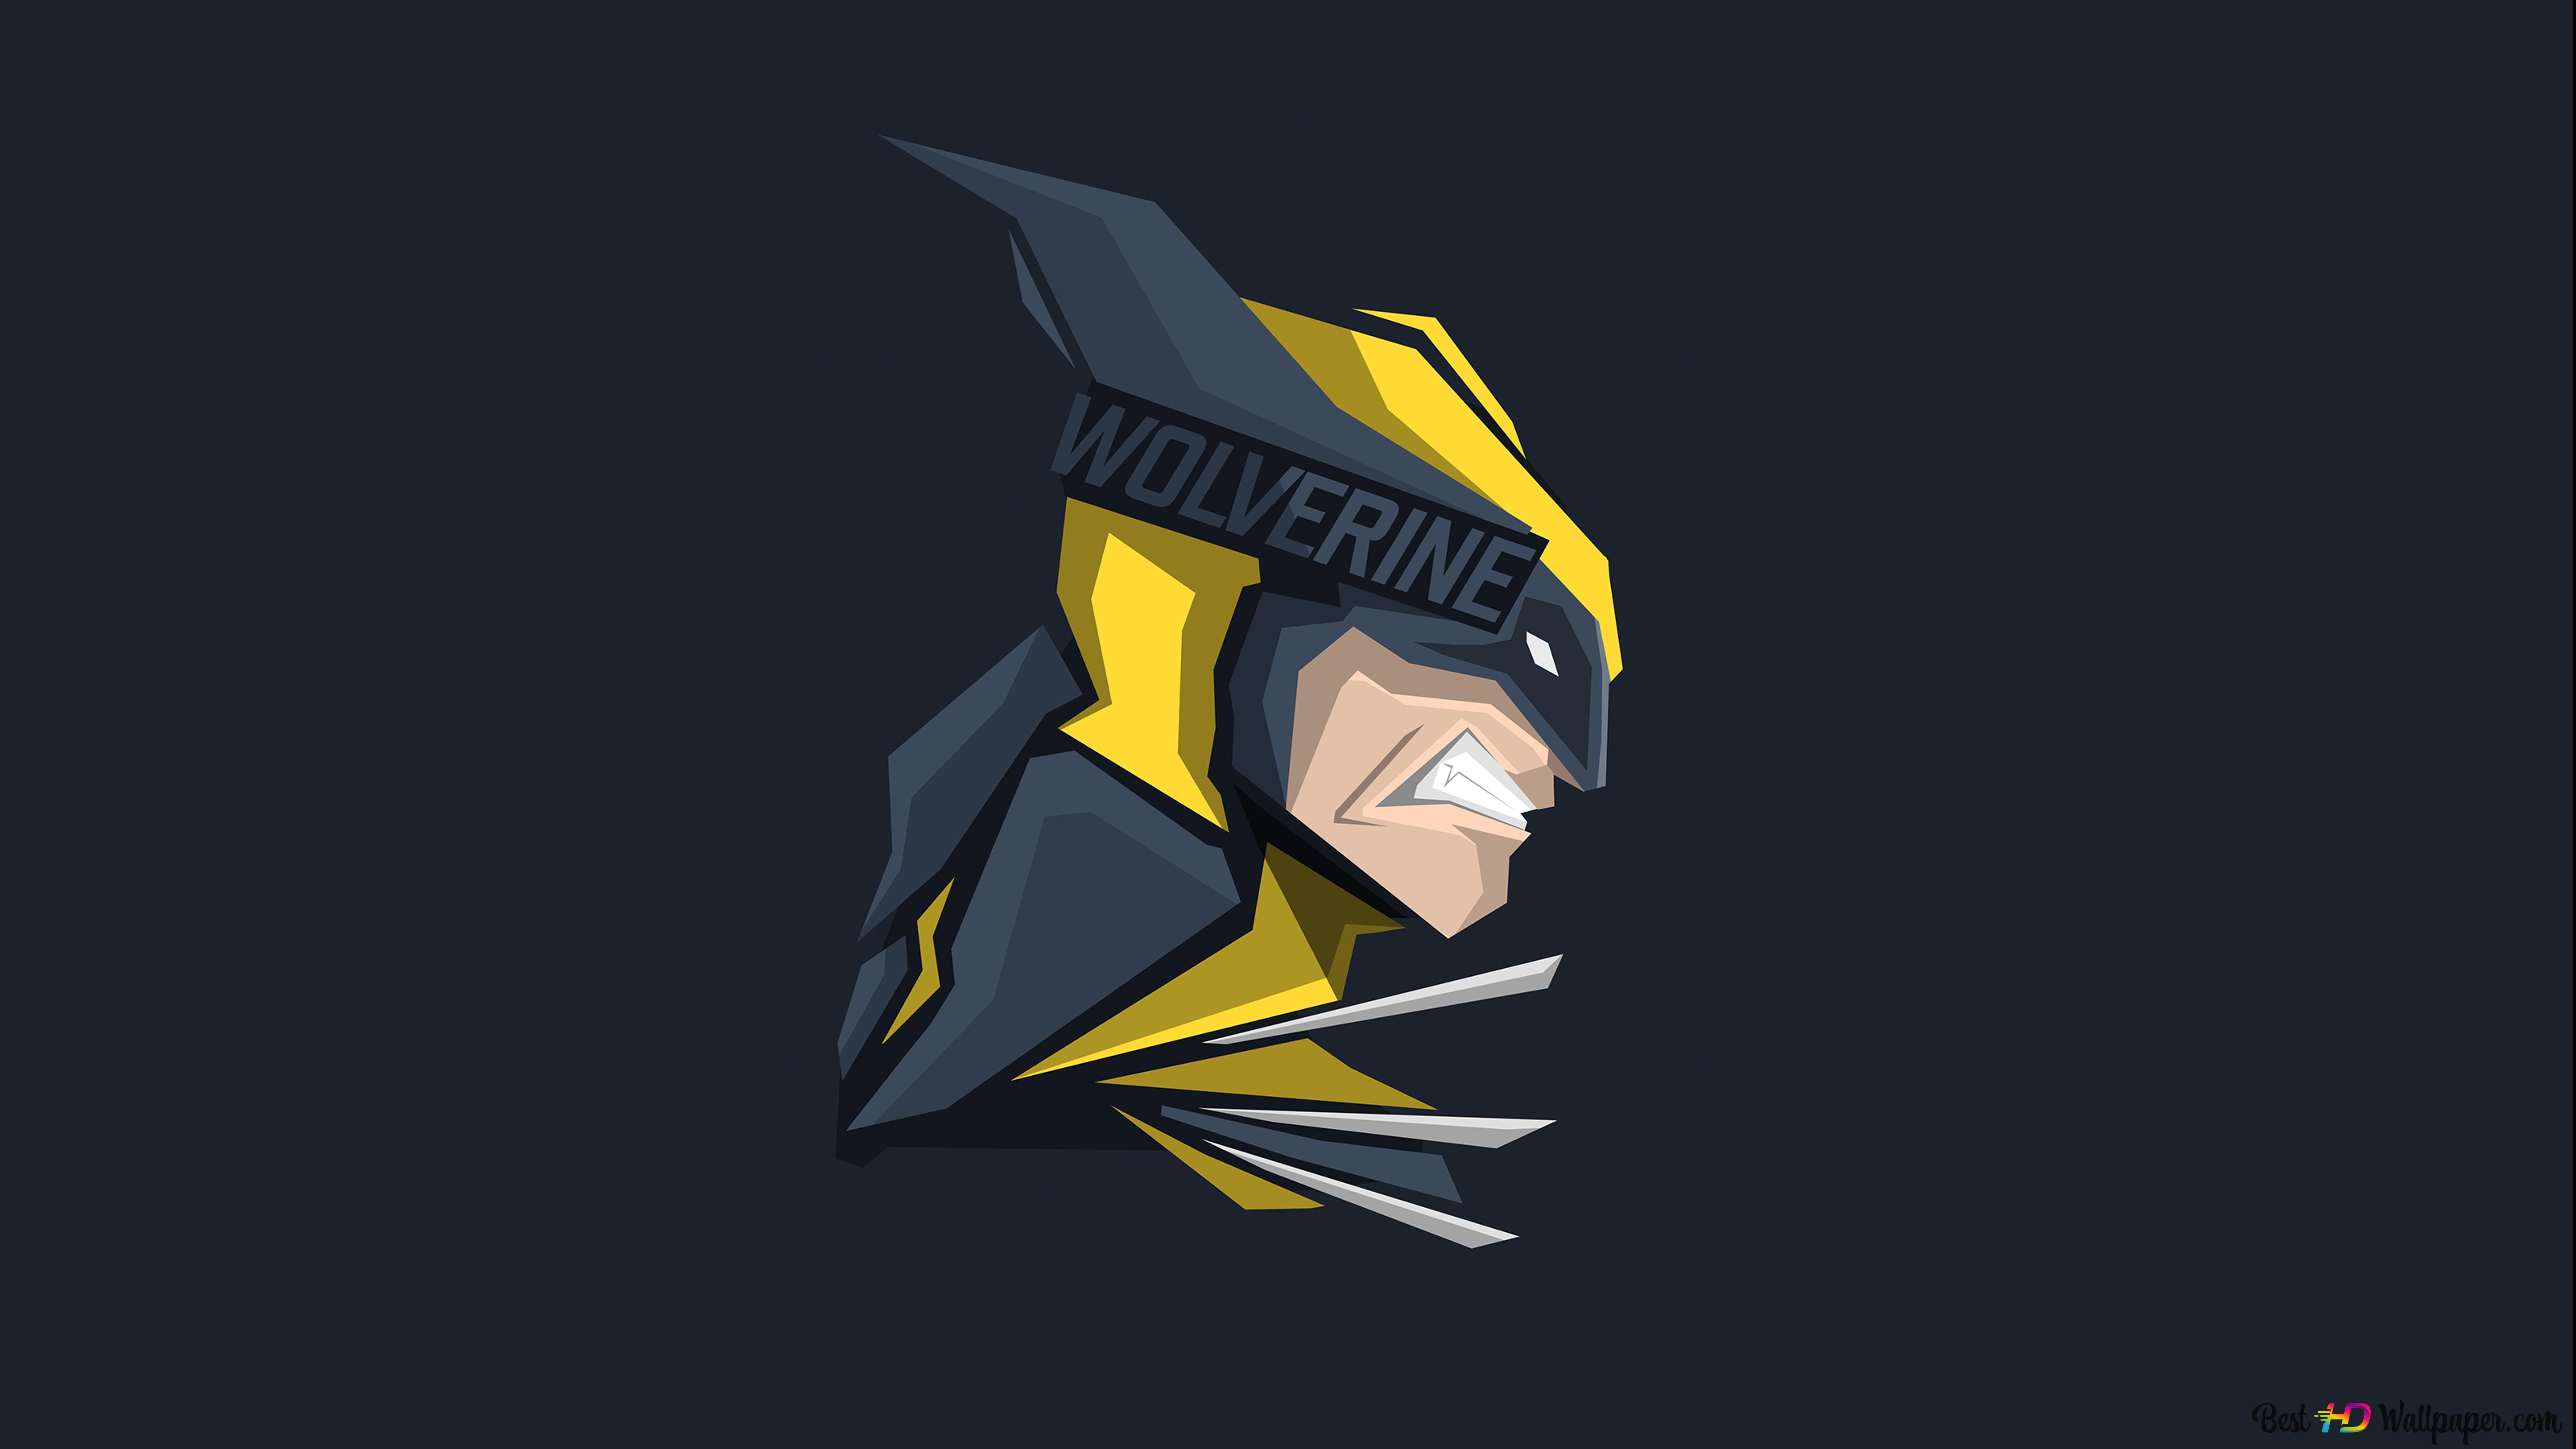 Marvel X Men Wolverine Minimalist Hd Wallpaper Download